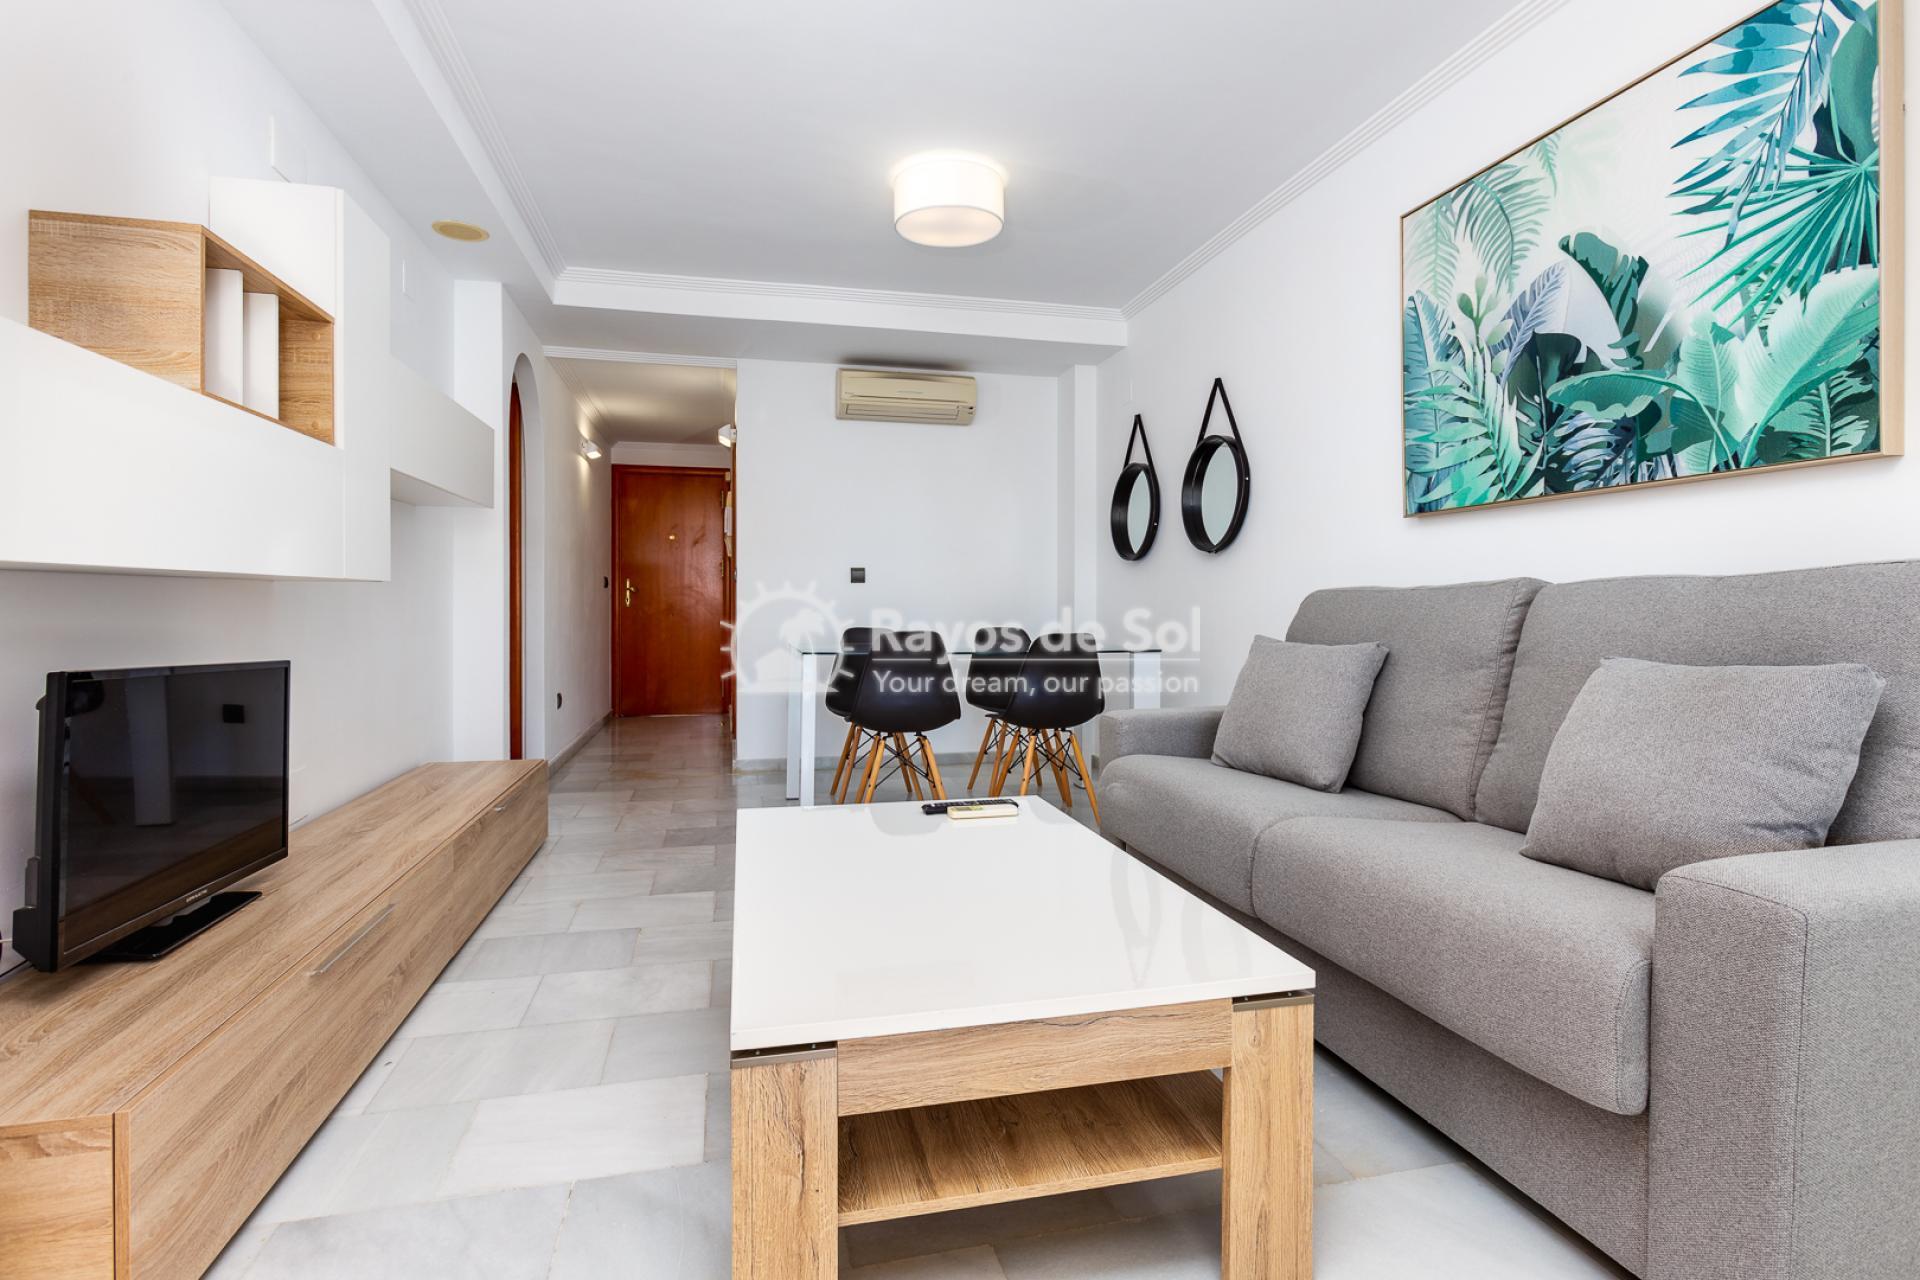 Turnekey first line apartments  in Altea, Costa Blanca (Alteabeach) - 16